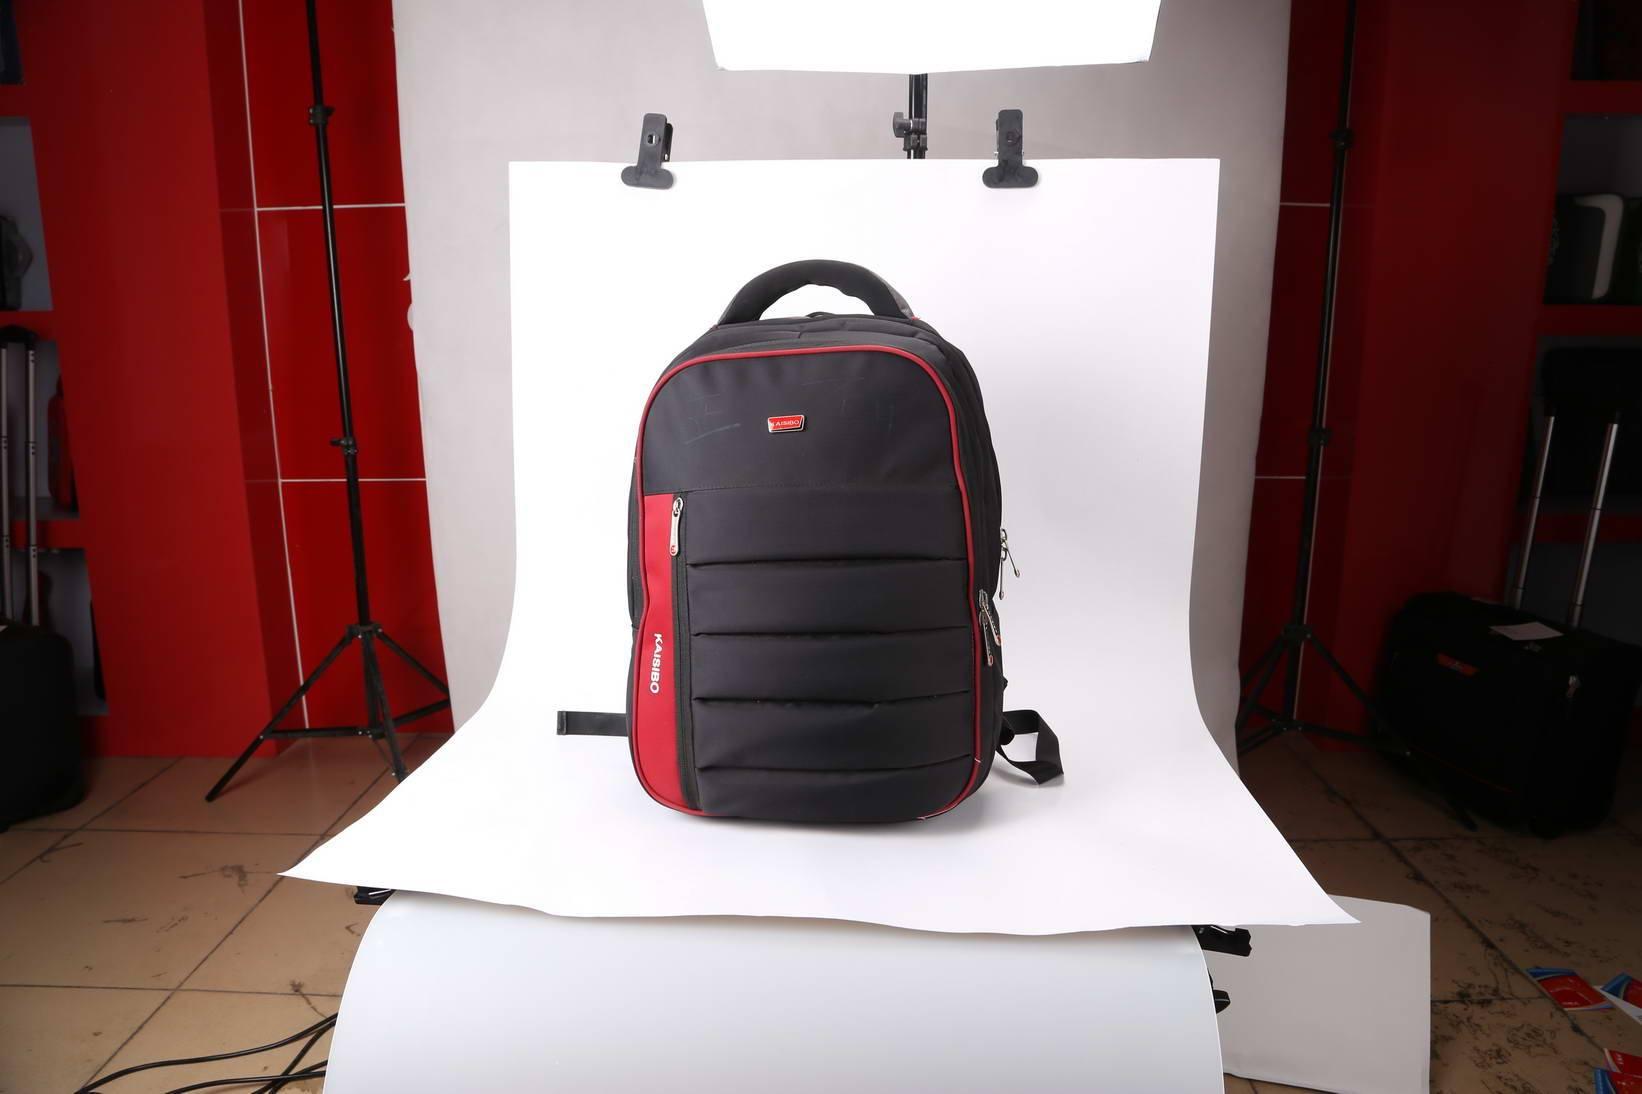 Nylon computer backpack